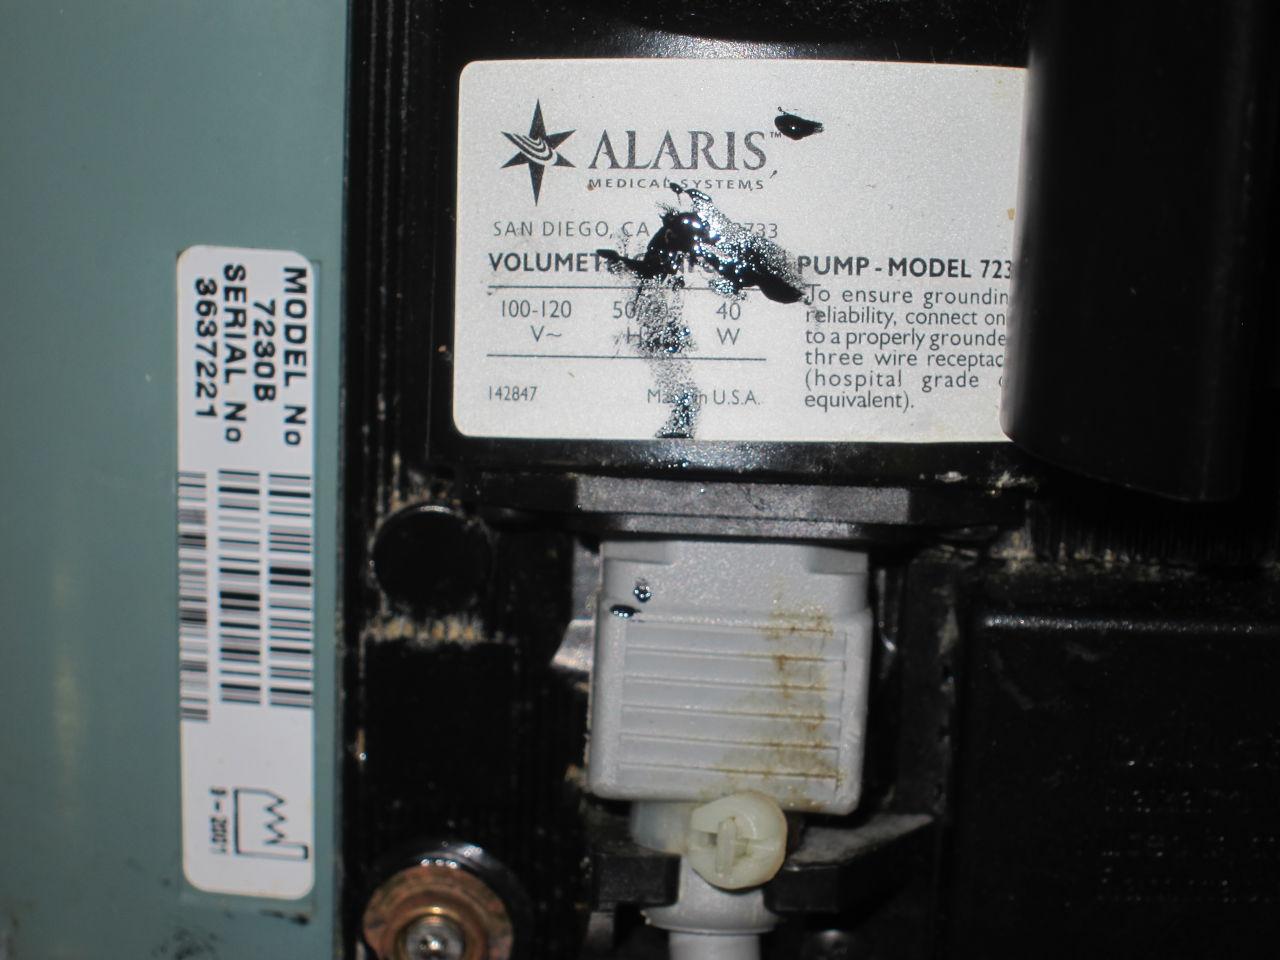 ALARIS 7230 Pump IV Infusion